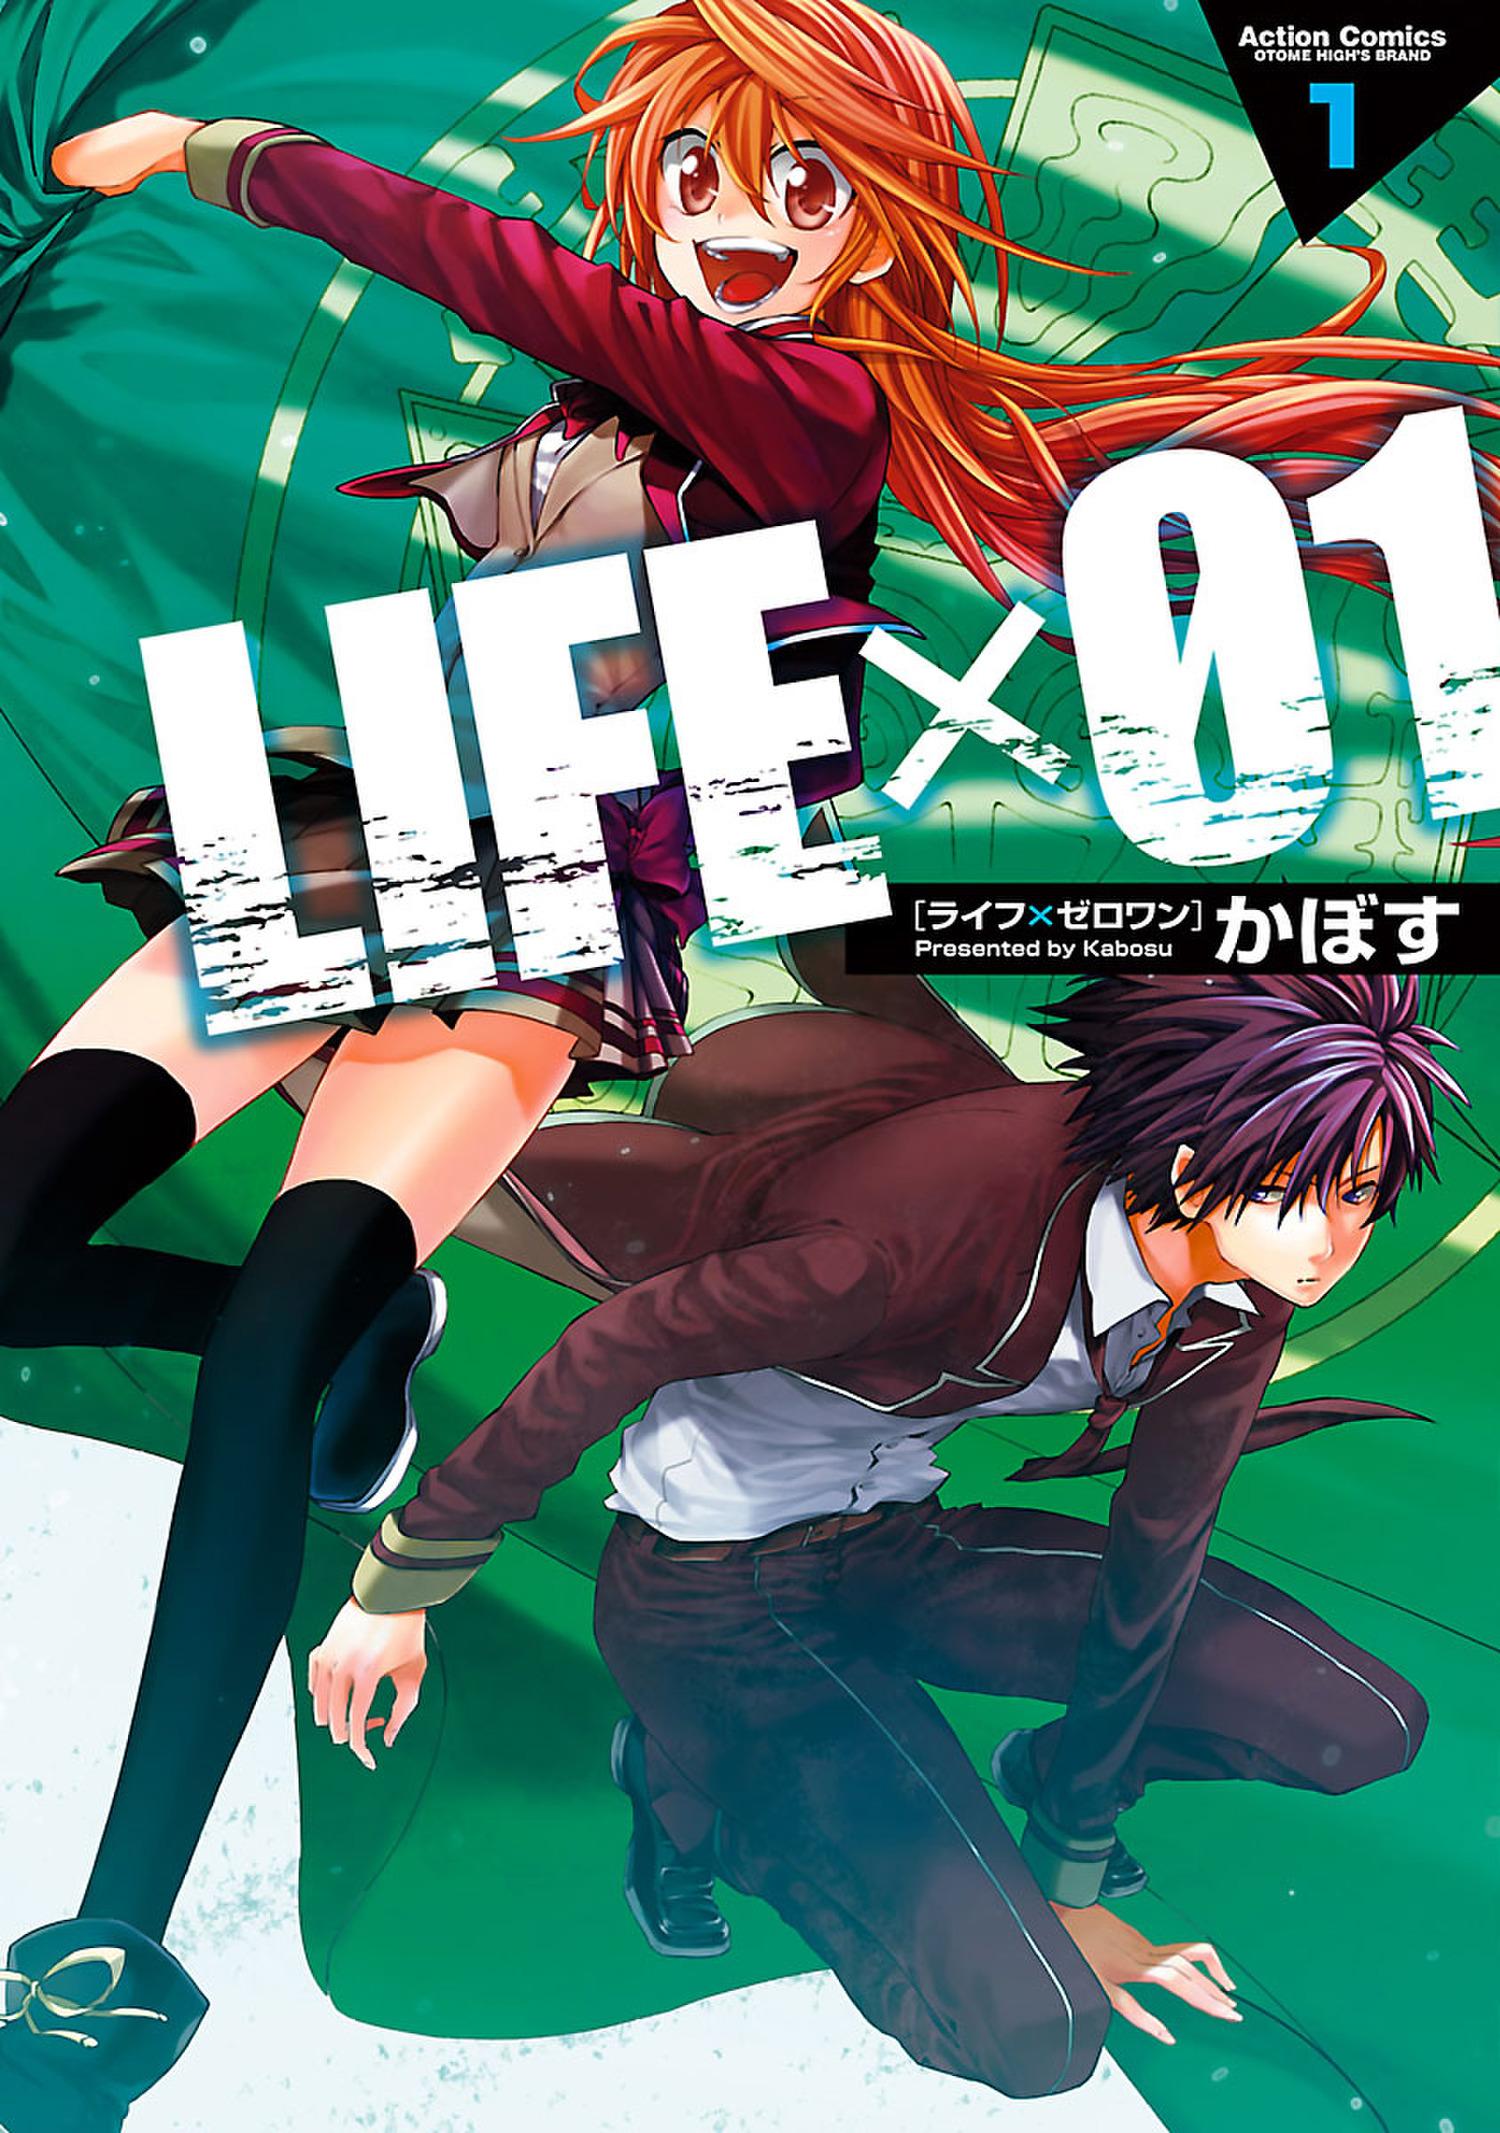 Lifex01